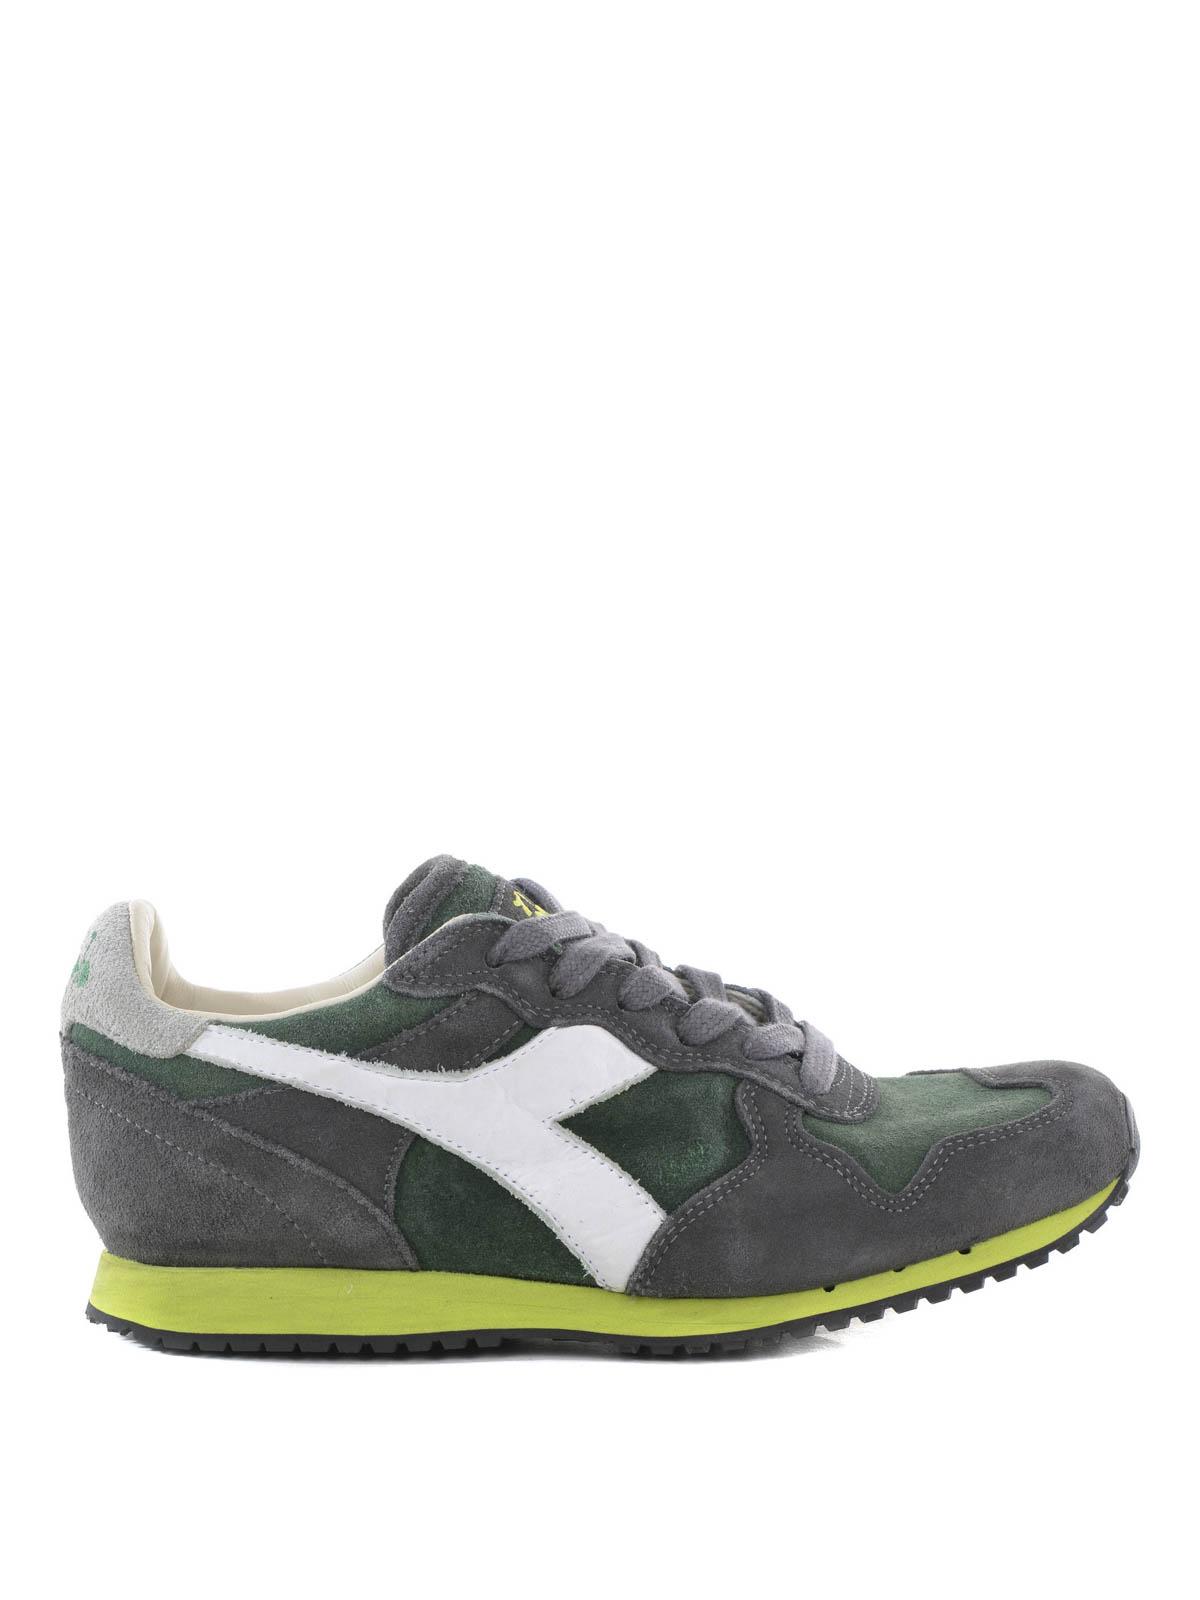 Diadora Heritage - Trident S SW sneakers - trainers - 157664 C5952 0cfecd0aeb7